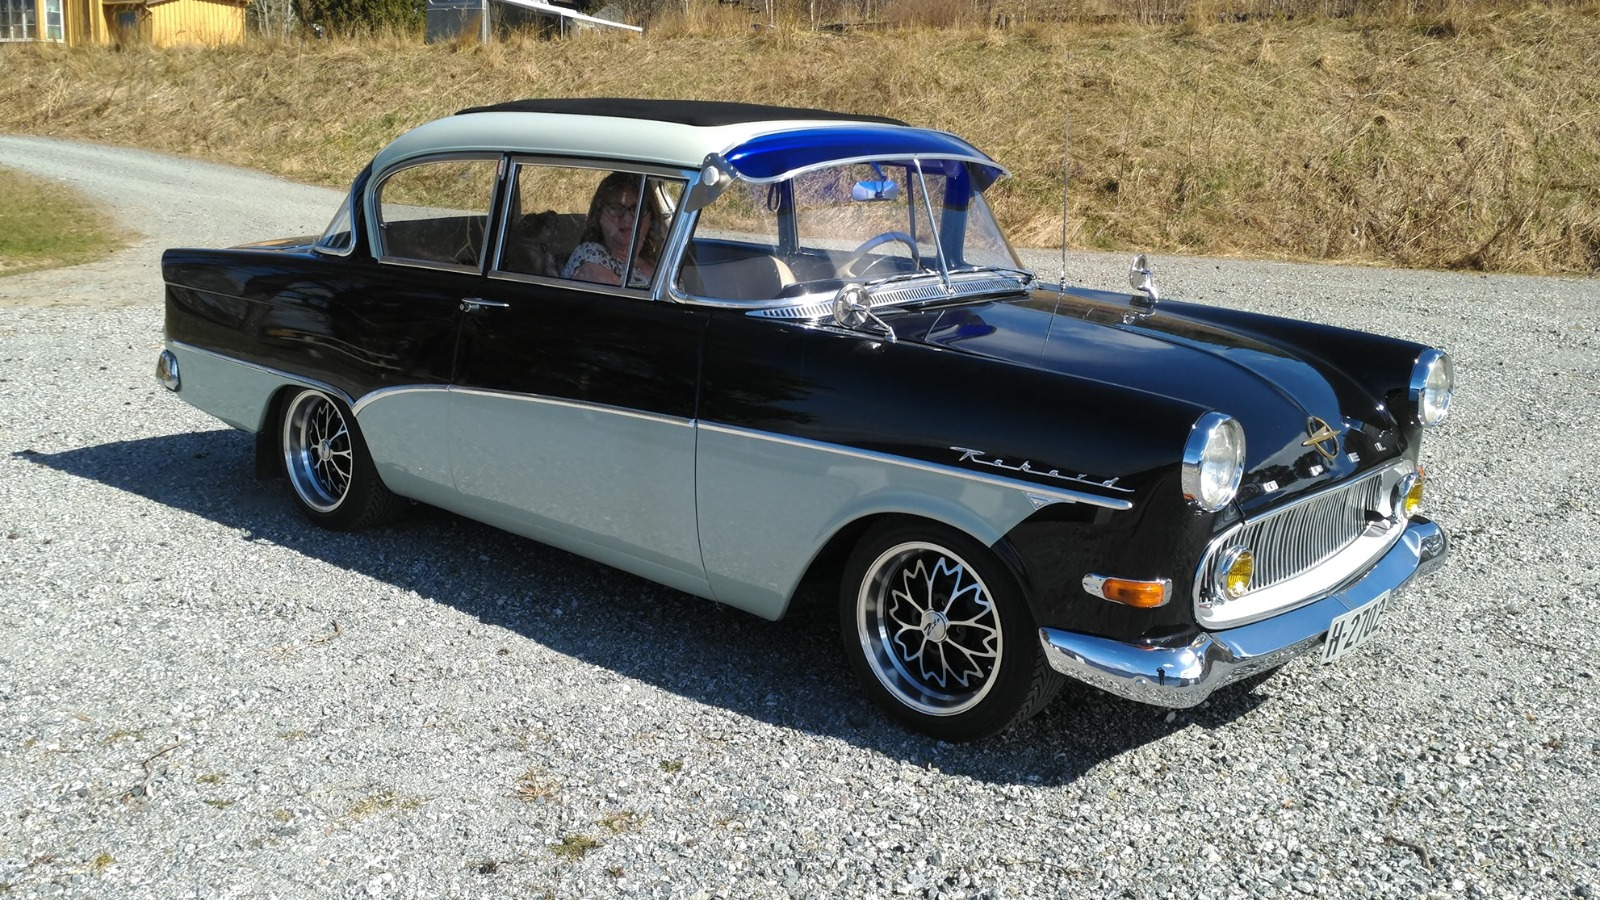 Kjell Runes flotte 1960 Opel Rekord P1.